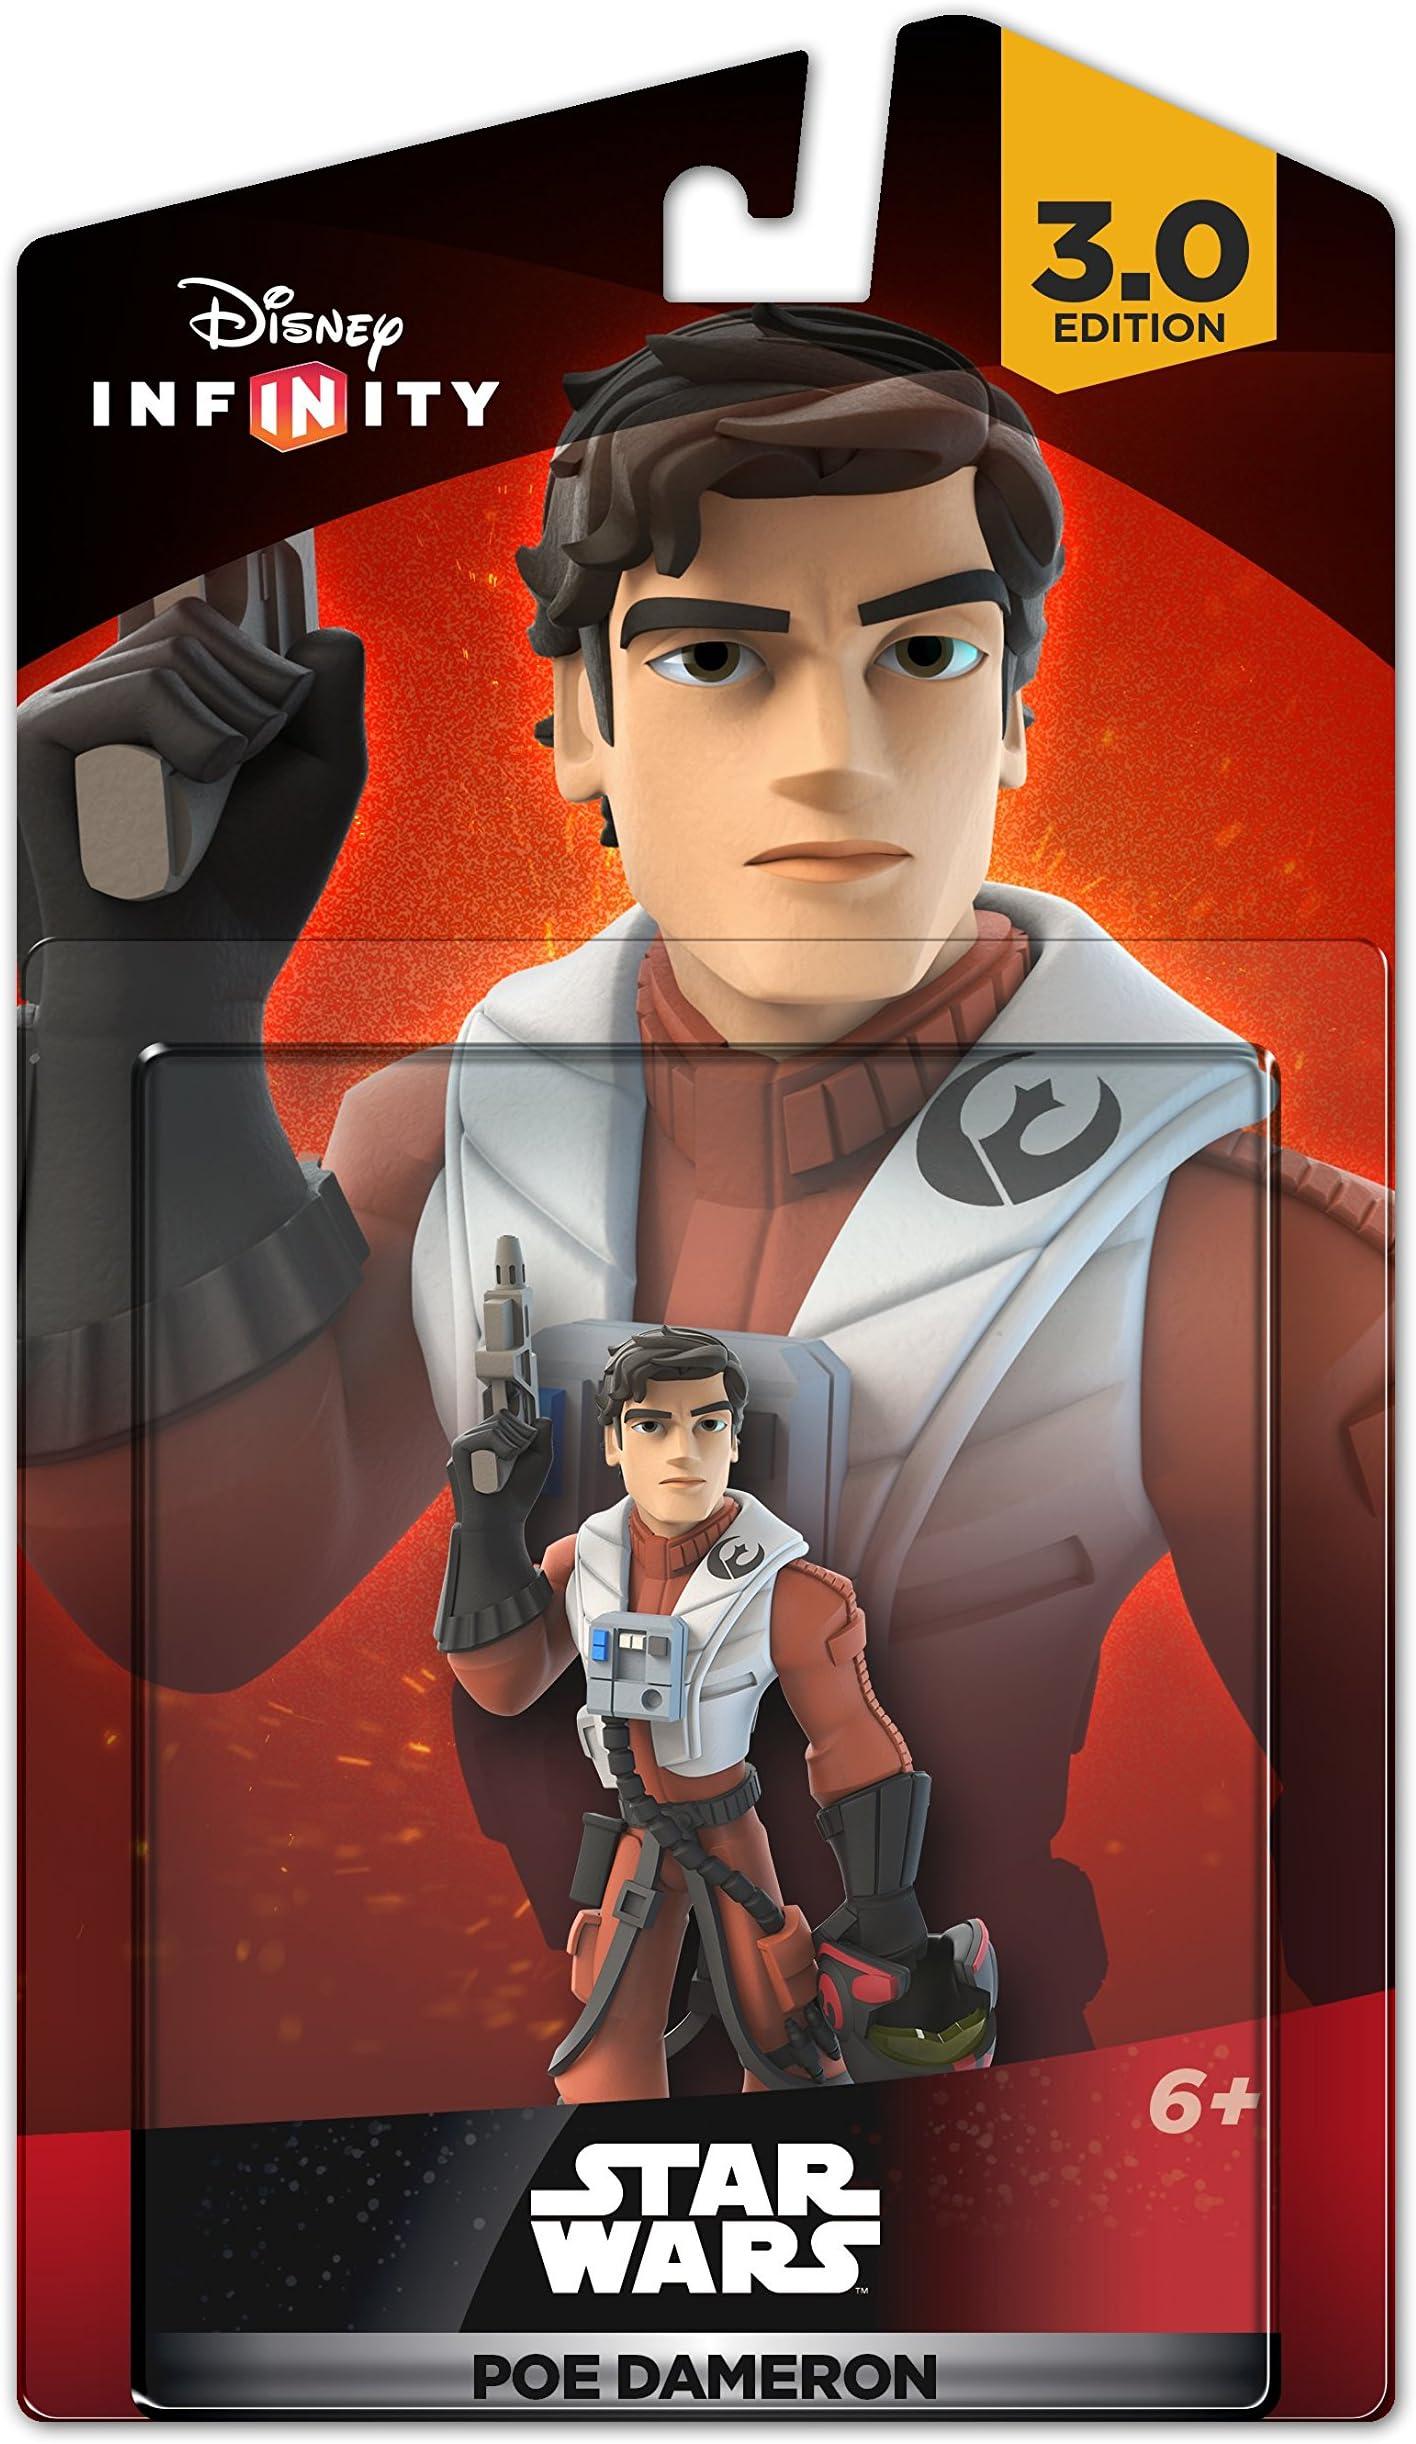 Amazon com: Disney Infinity 3 0 Edition: Star Wars The Force Awakens